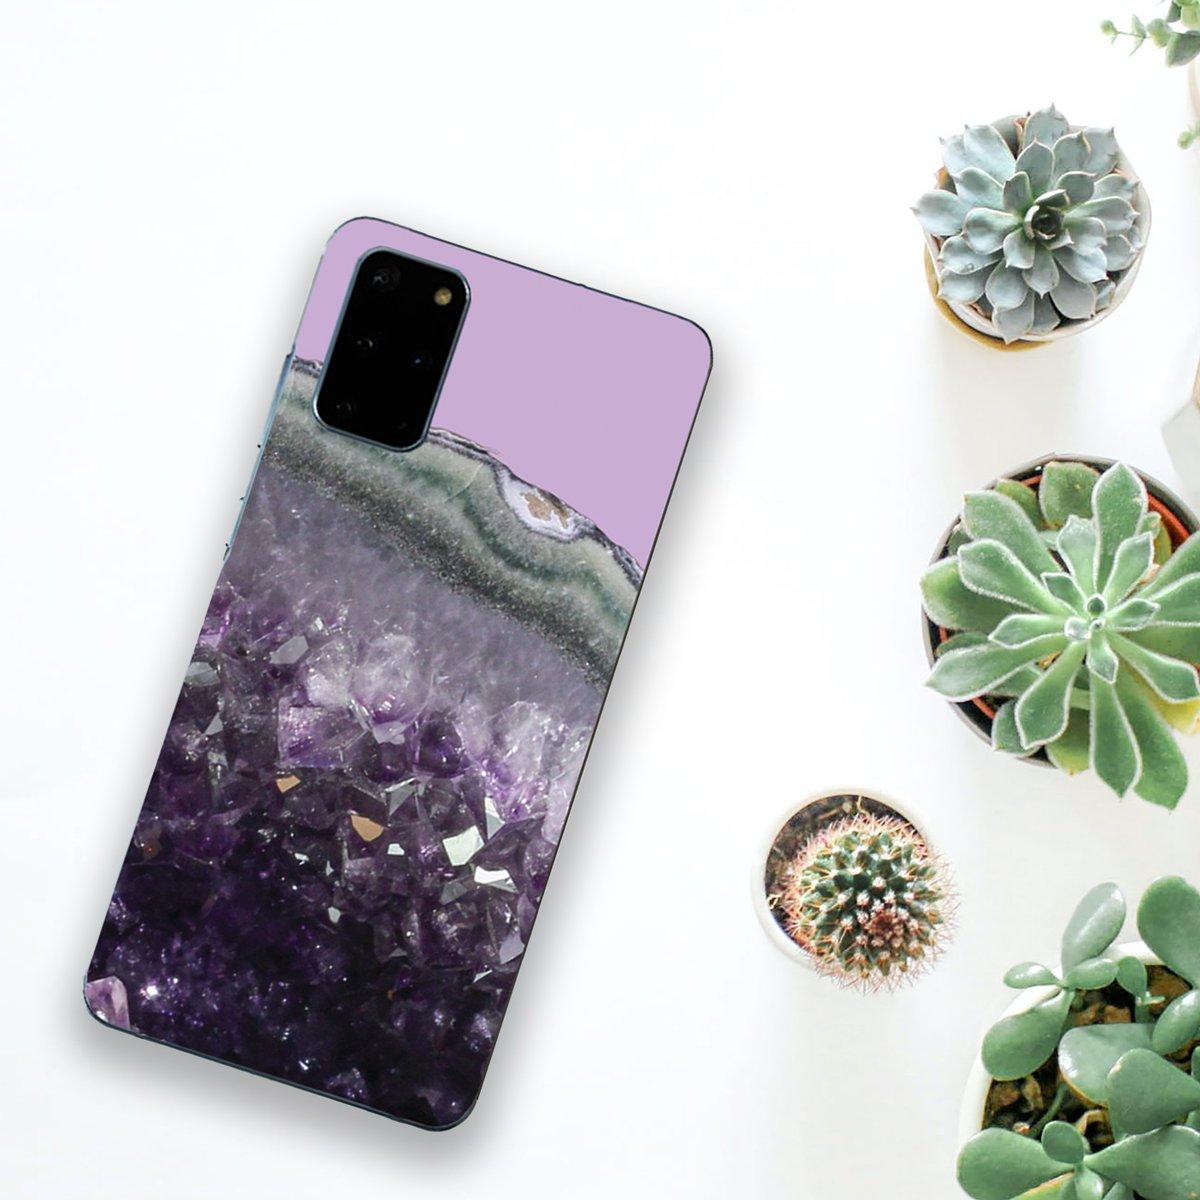 My Precious #Samsung #Galaxy  #S20Plus #S20 #SamsungGalaxyS20Plus #phones #accessories #vinyl #skins #decals #stickers #wraps #MightySkins #vinylskins #vinylstickers #purple #amethyst #precious #designpic.twitter.com/9tc8gUmC7K